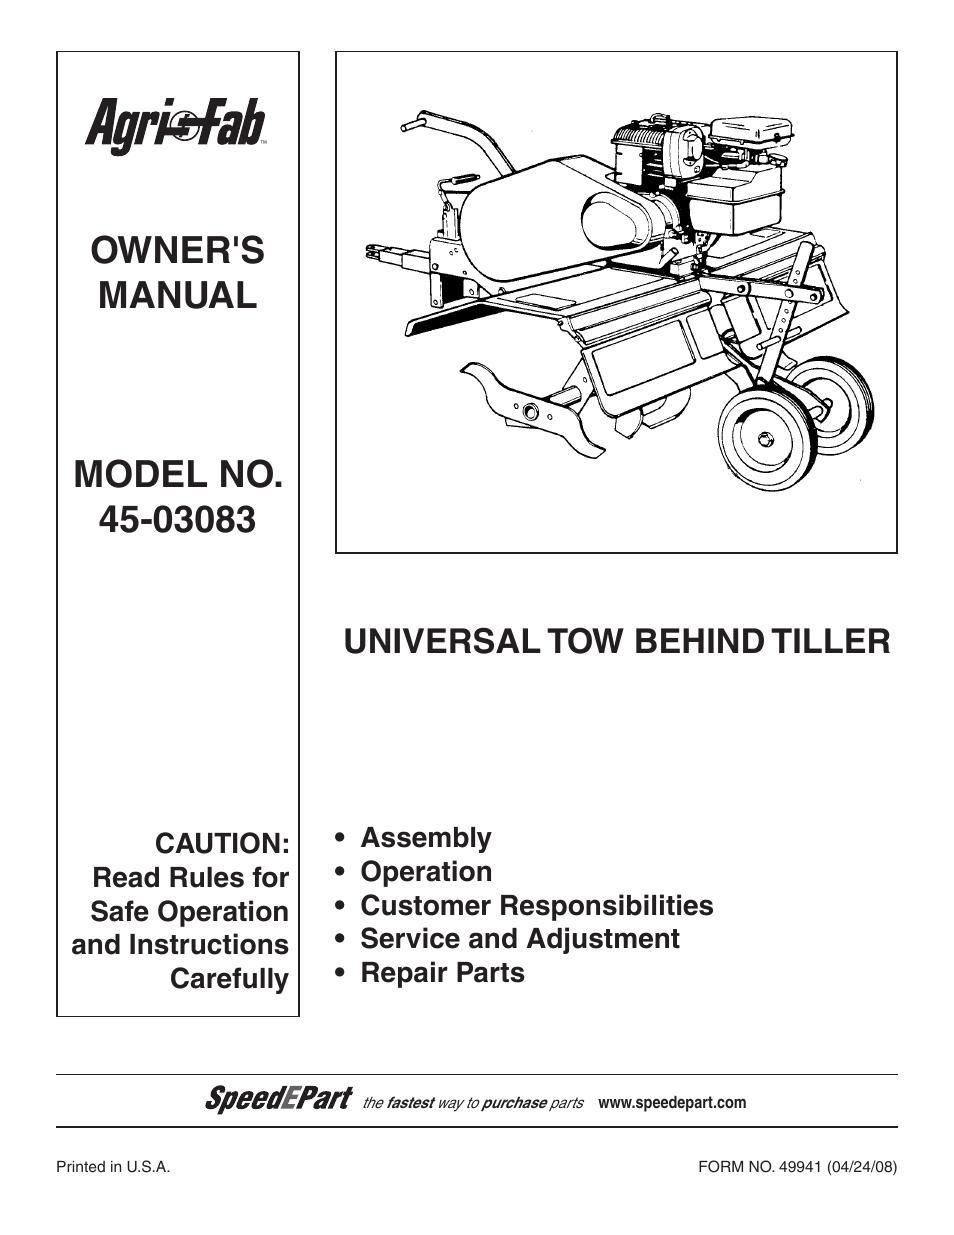 Owners manual model no. Modelo no. Modã¨le no. Utility. Agri-fab.